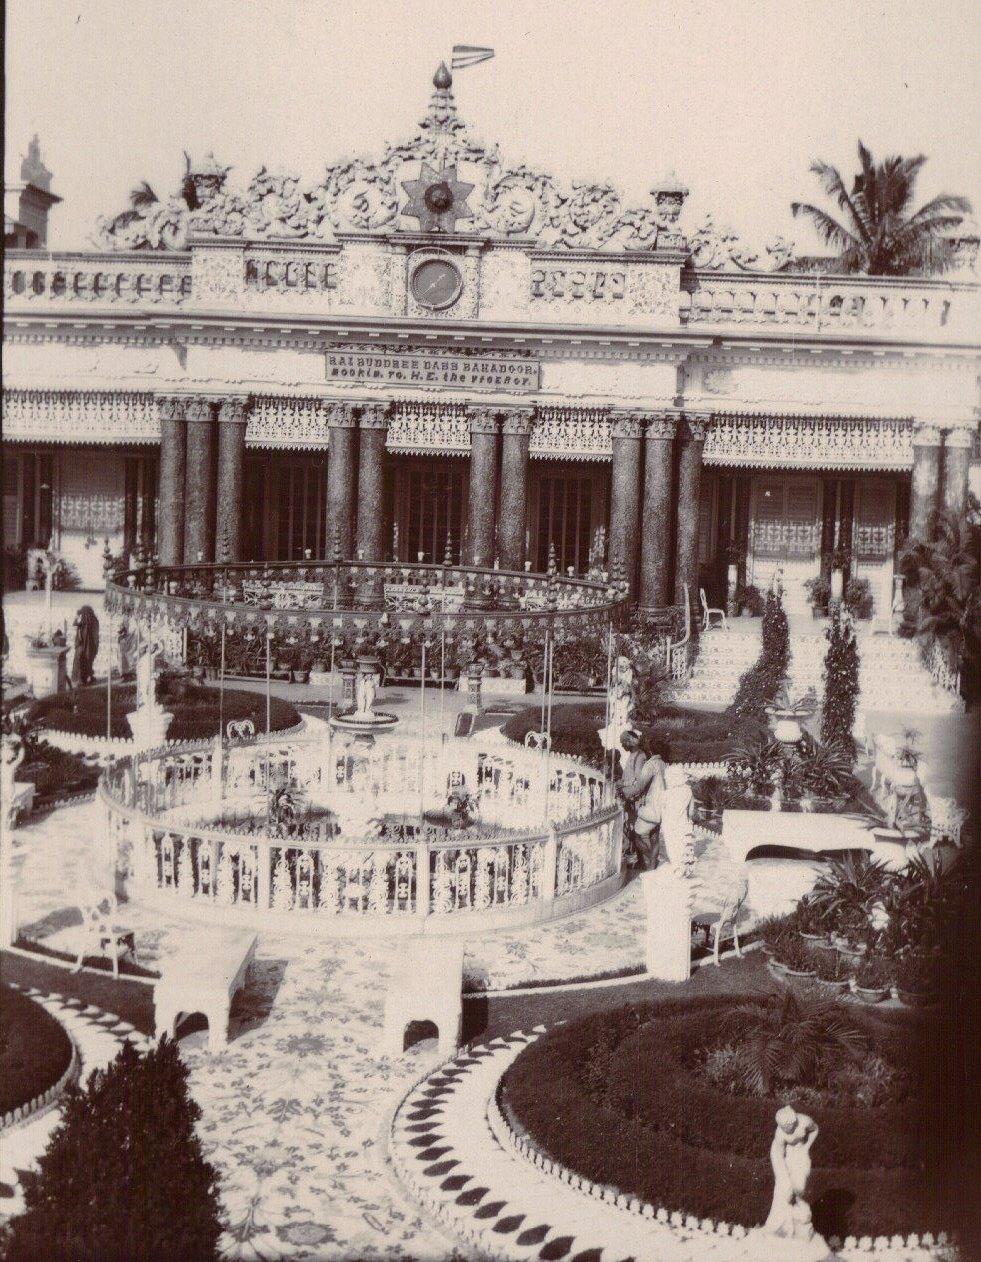 c. 1903 Rai Buddree das Bahadur & Sons, 152 Harrison Road, Calcutta